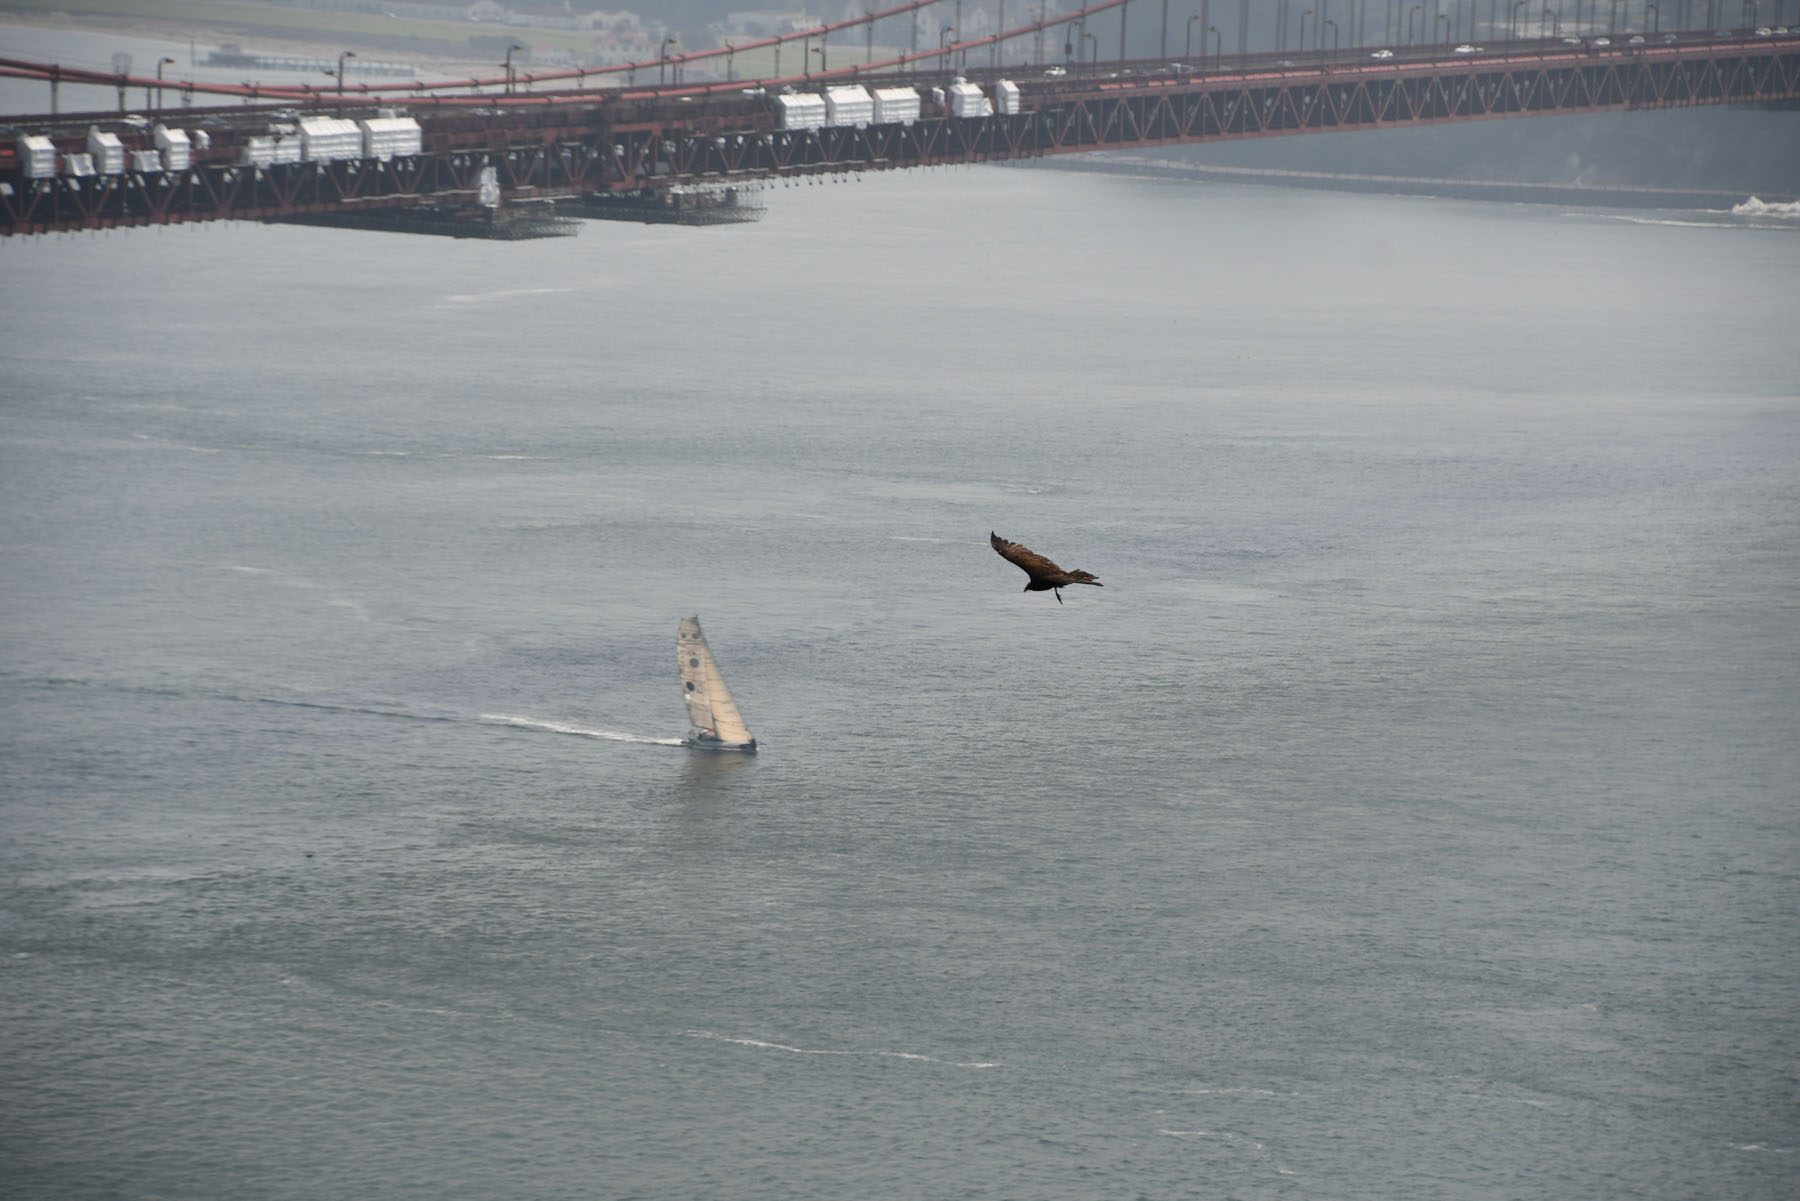 Changabang sails under Golden Gate Bridge